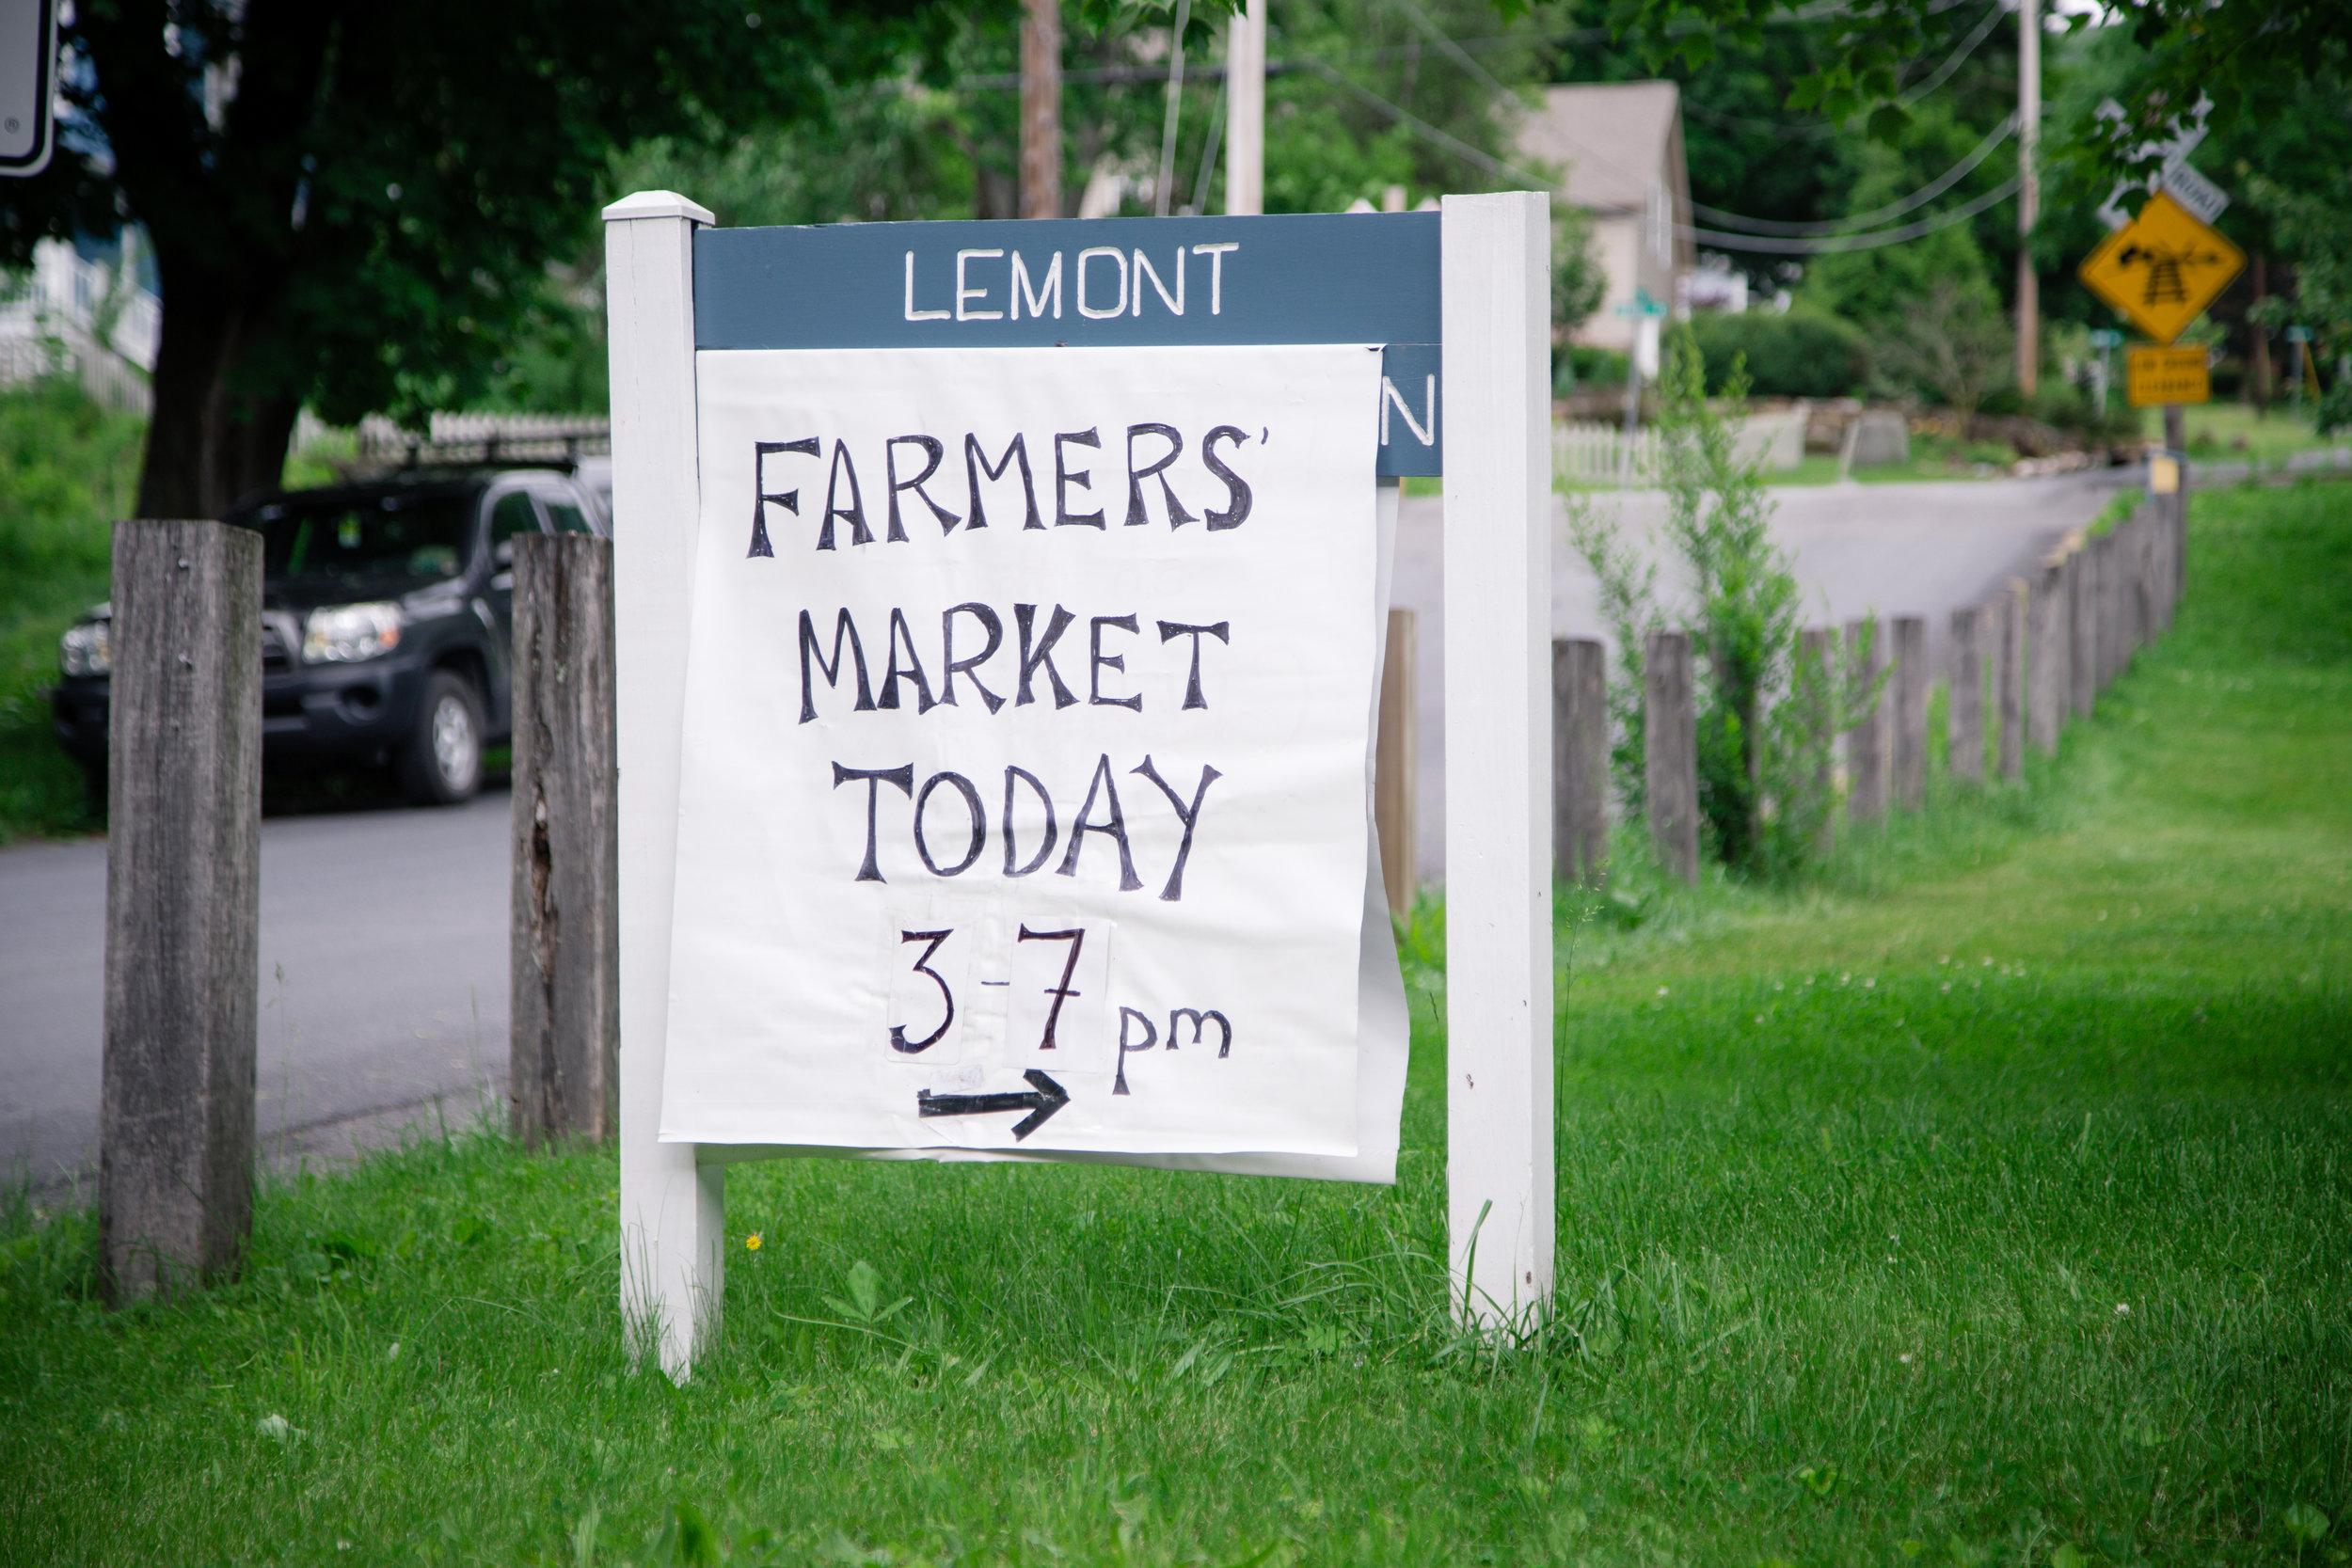 160 // 366 Wednesday farmer's market stop